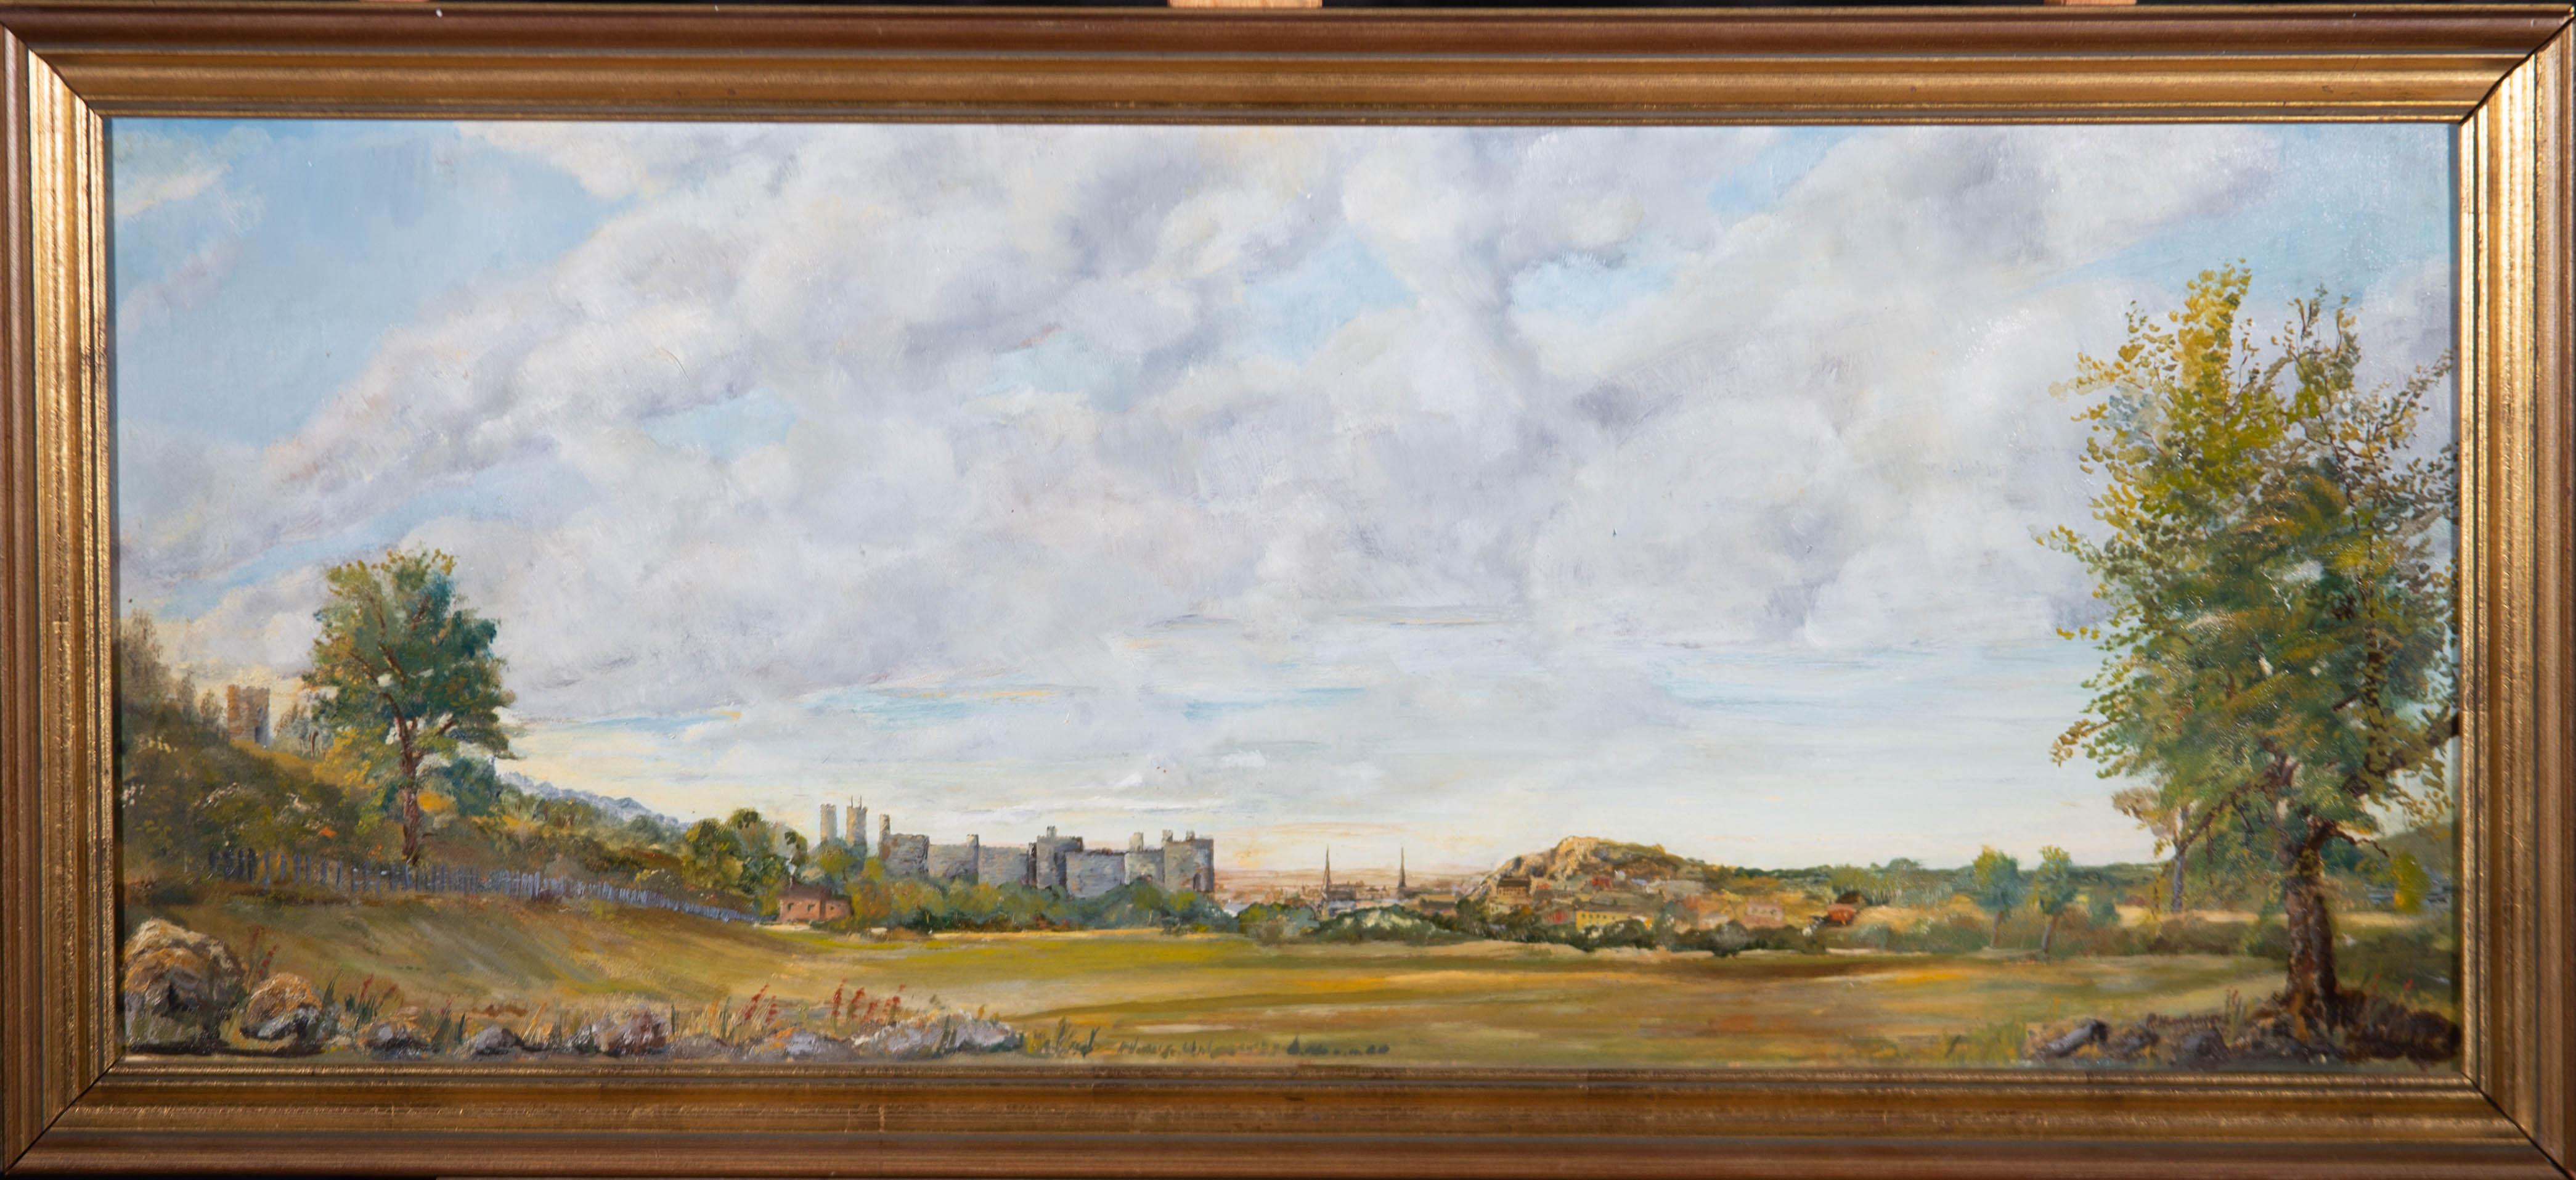 R. Humphreys - 20th Century Oil, Castle in a Landscape